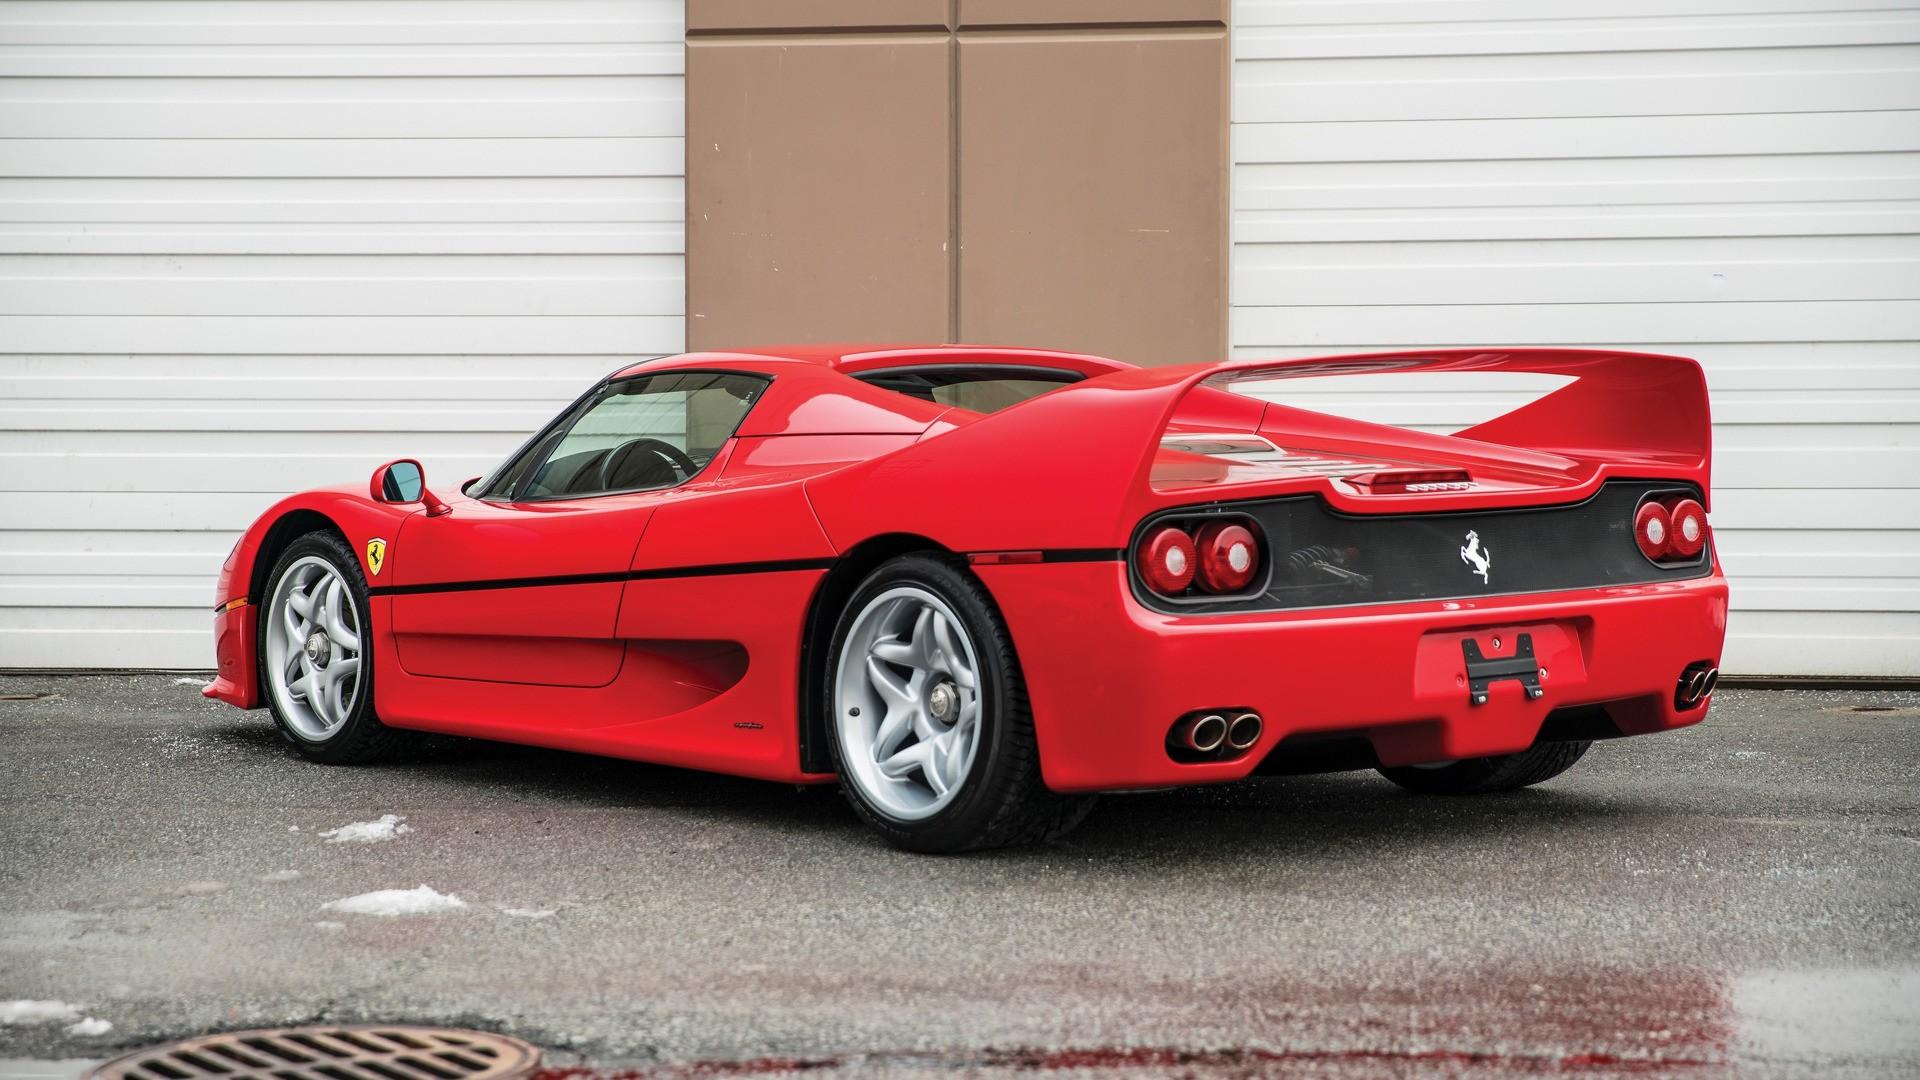 Ferrari F50 Mike Tyson